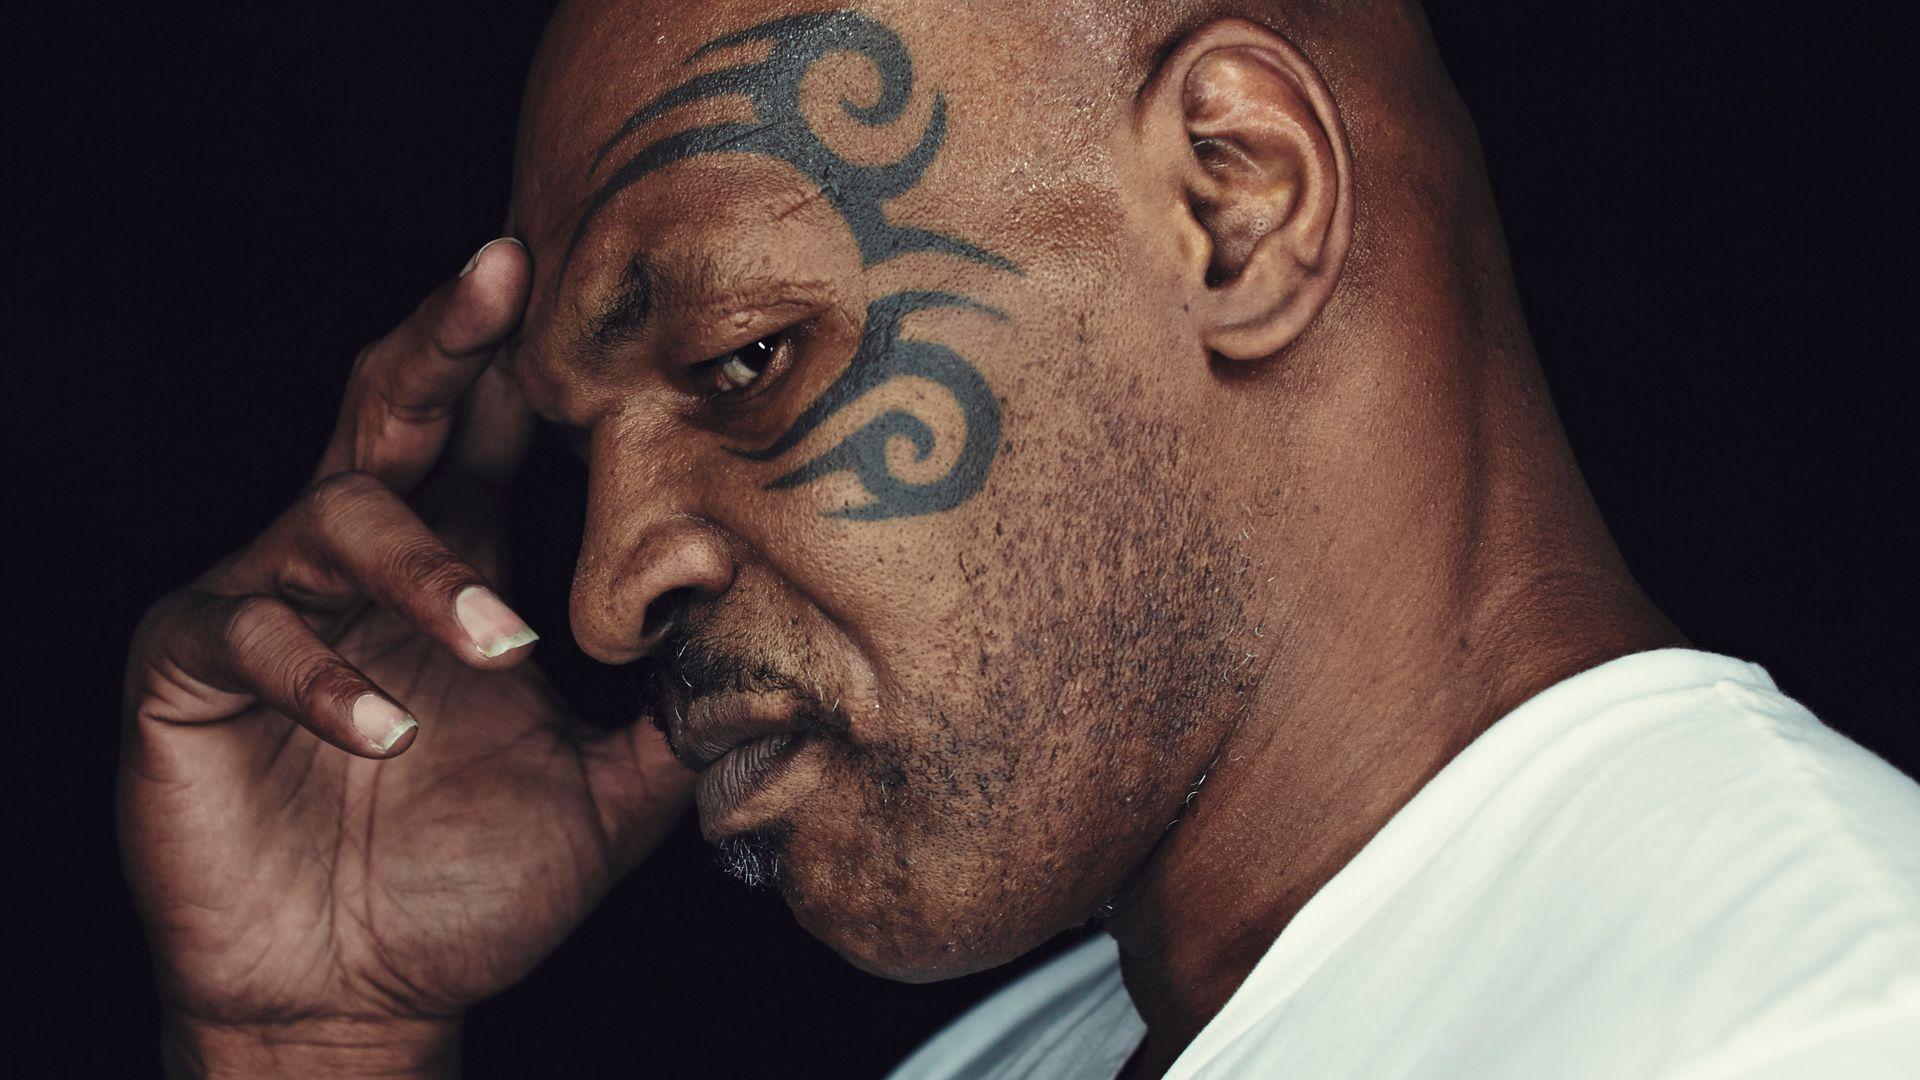 10 wild Mike Tyson stories